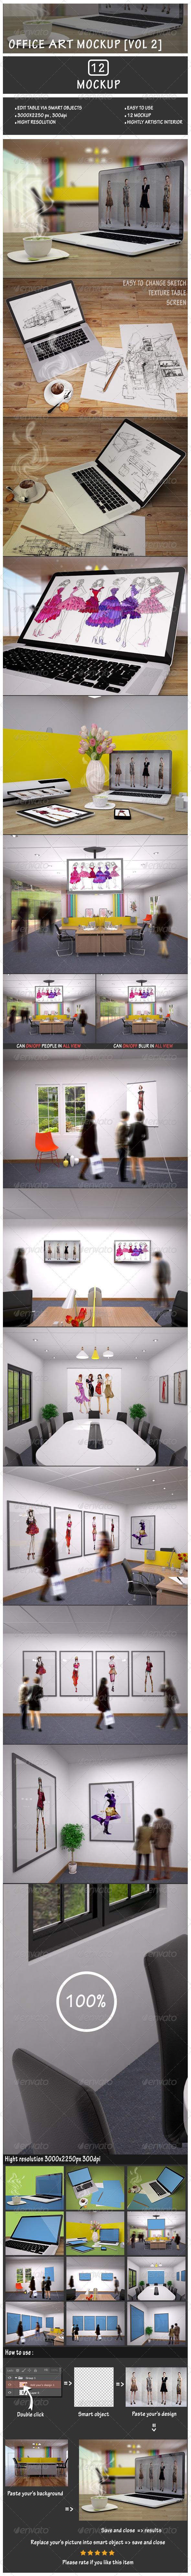 GraphicRiver Office Art Mockup Vol 2 7666993